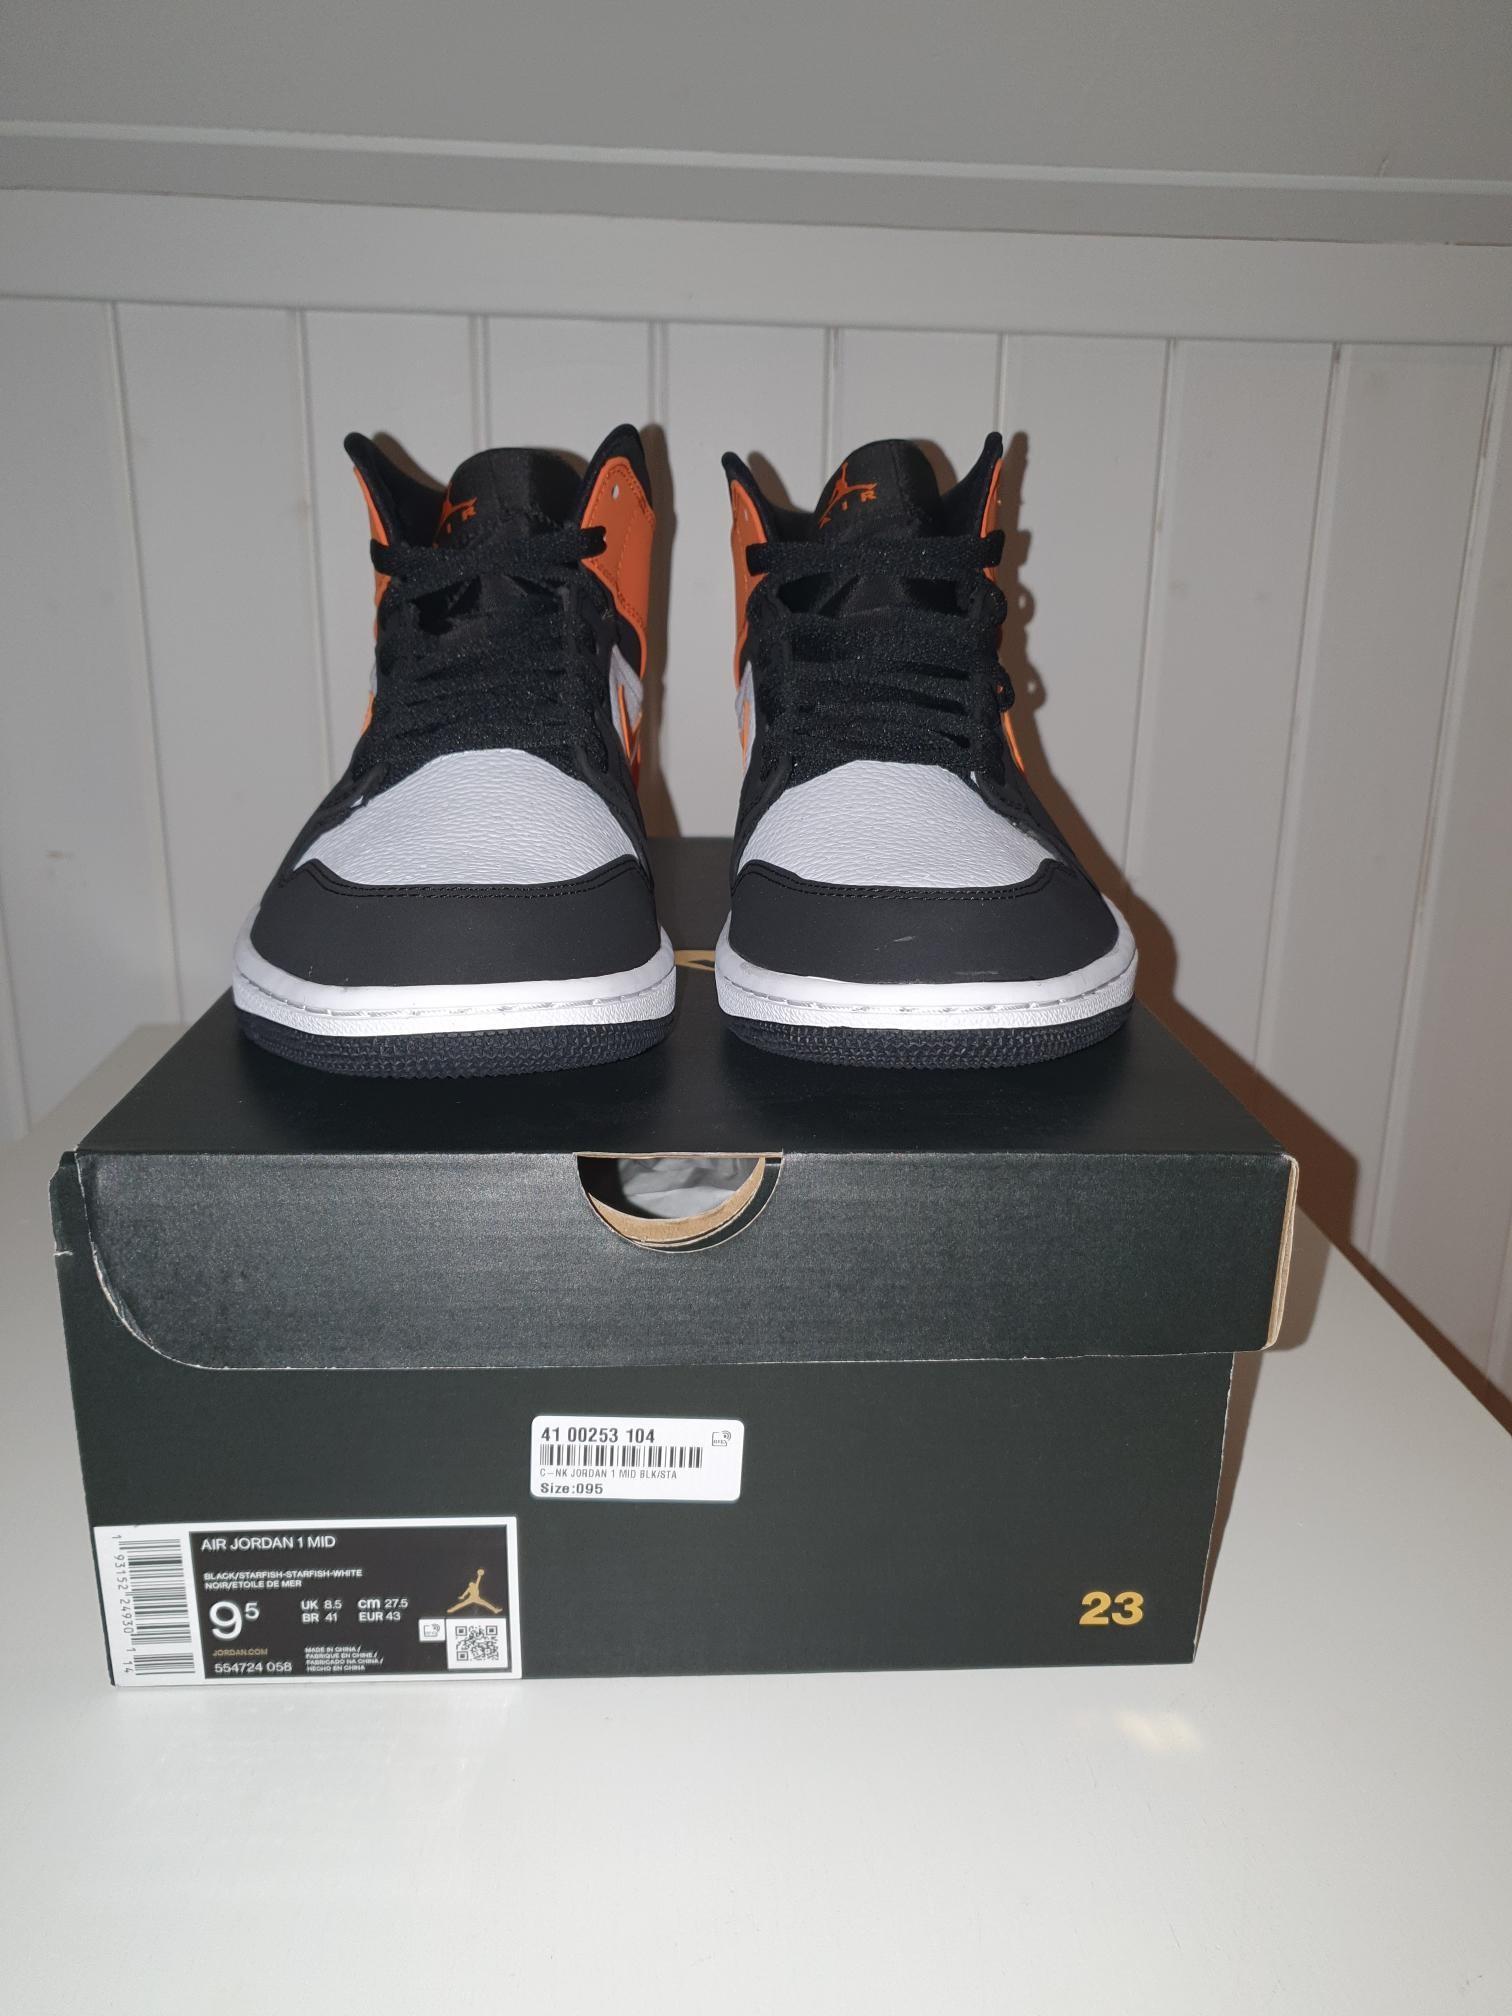 Nike Air Jordan Retro 1 Mid Shattered Backboard Starfis